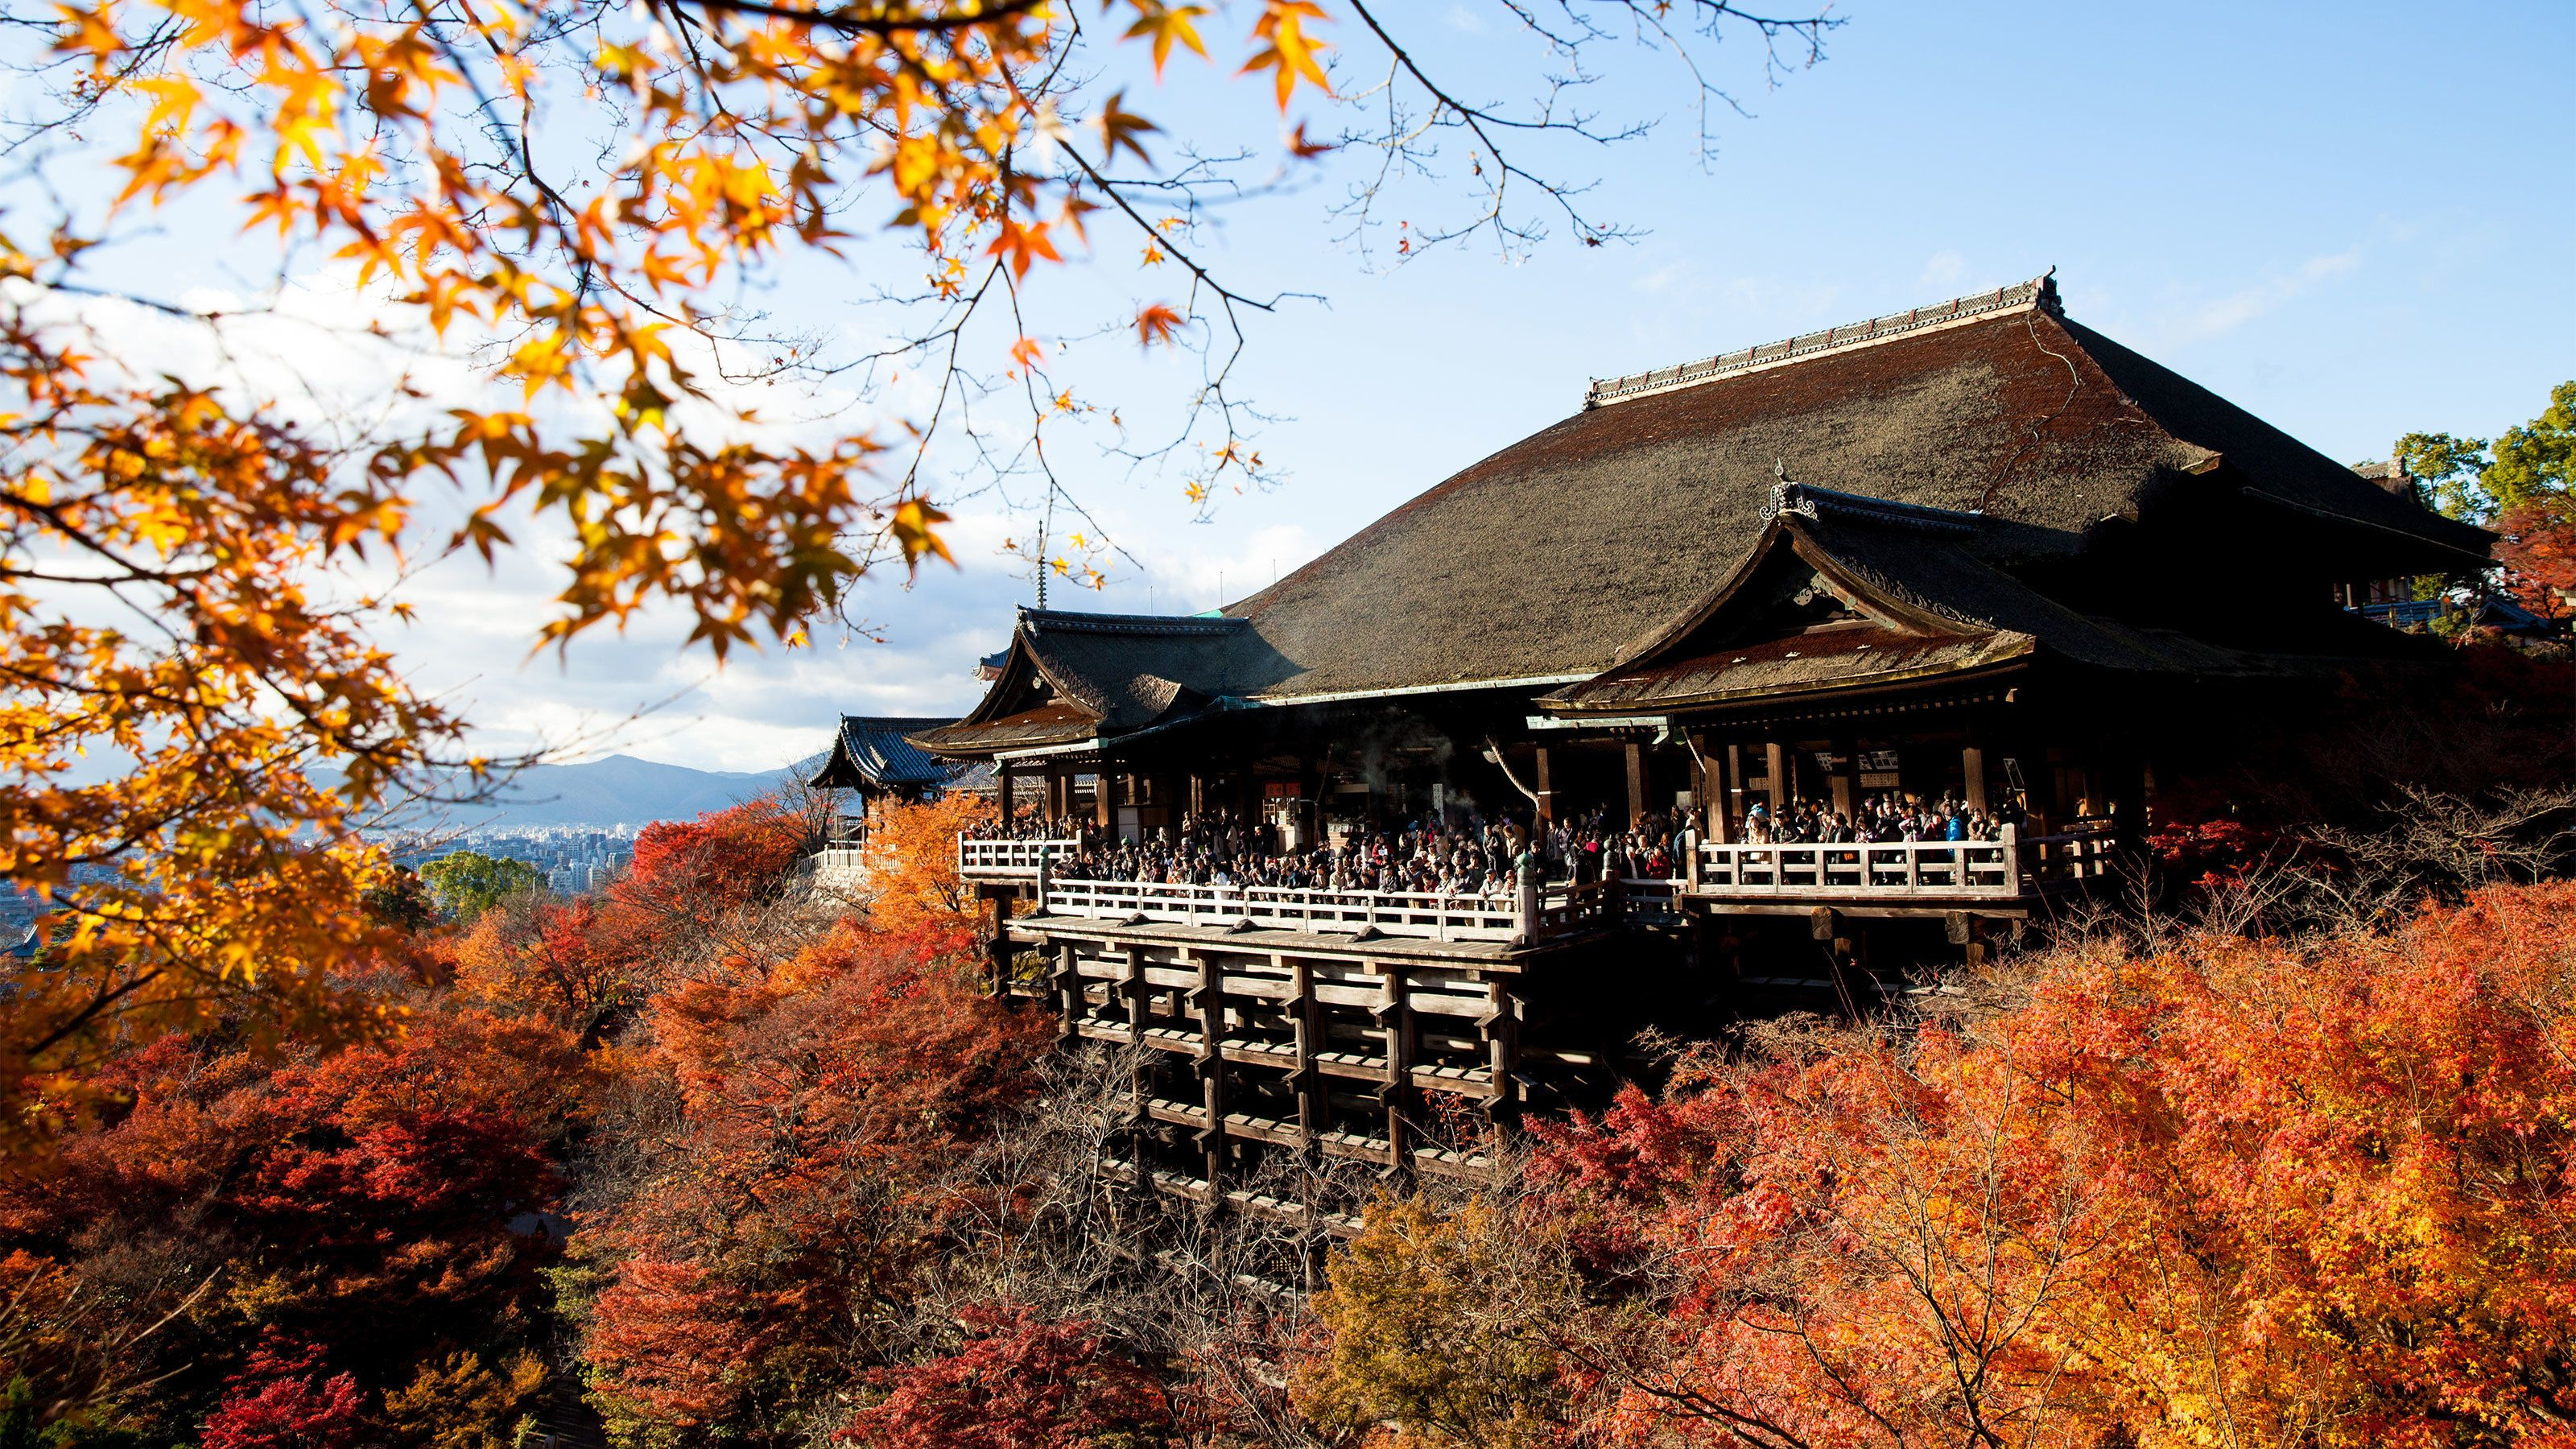 Serene view of the Kiyomizu-dera Temple in Kyoto, Japan